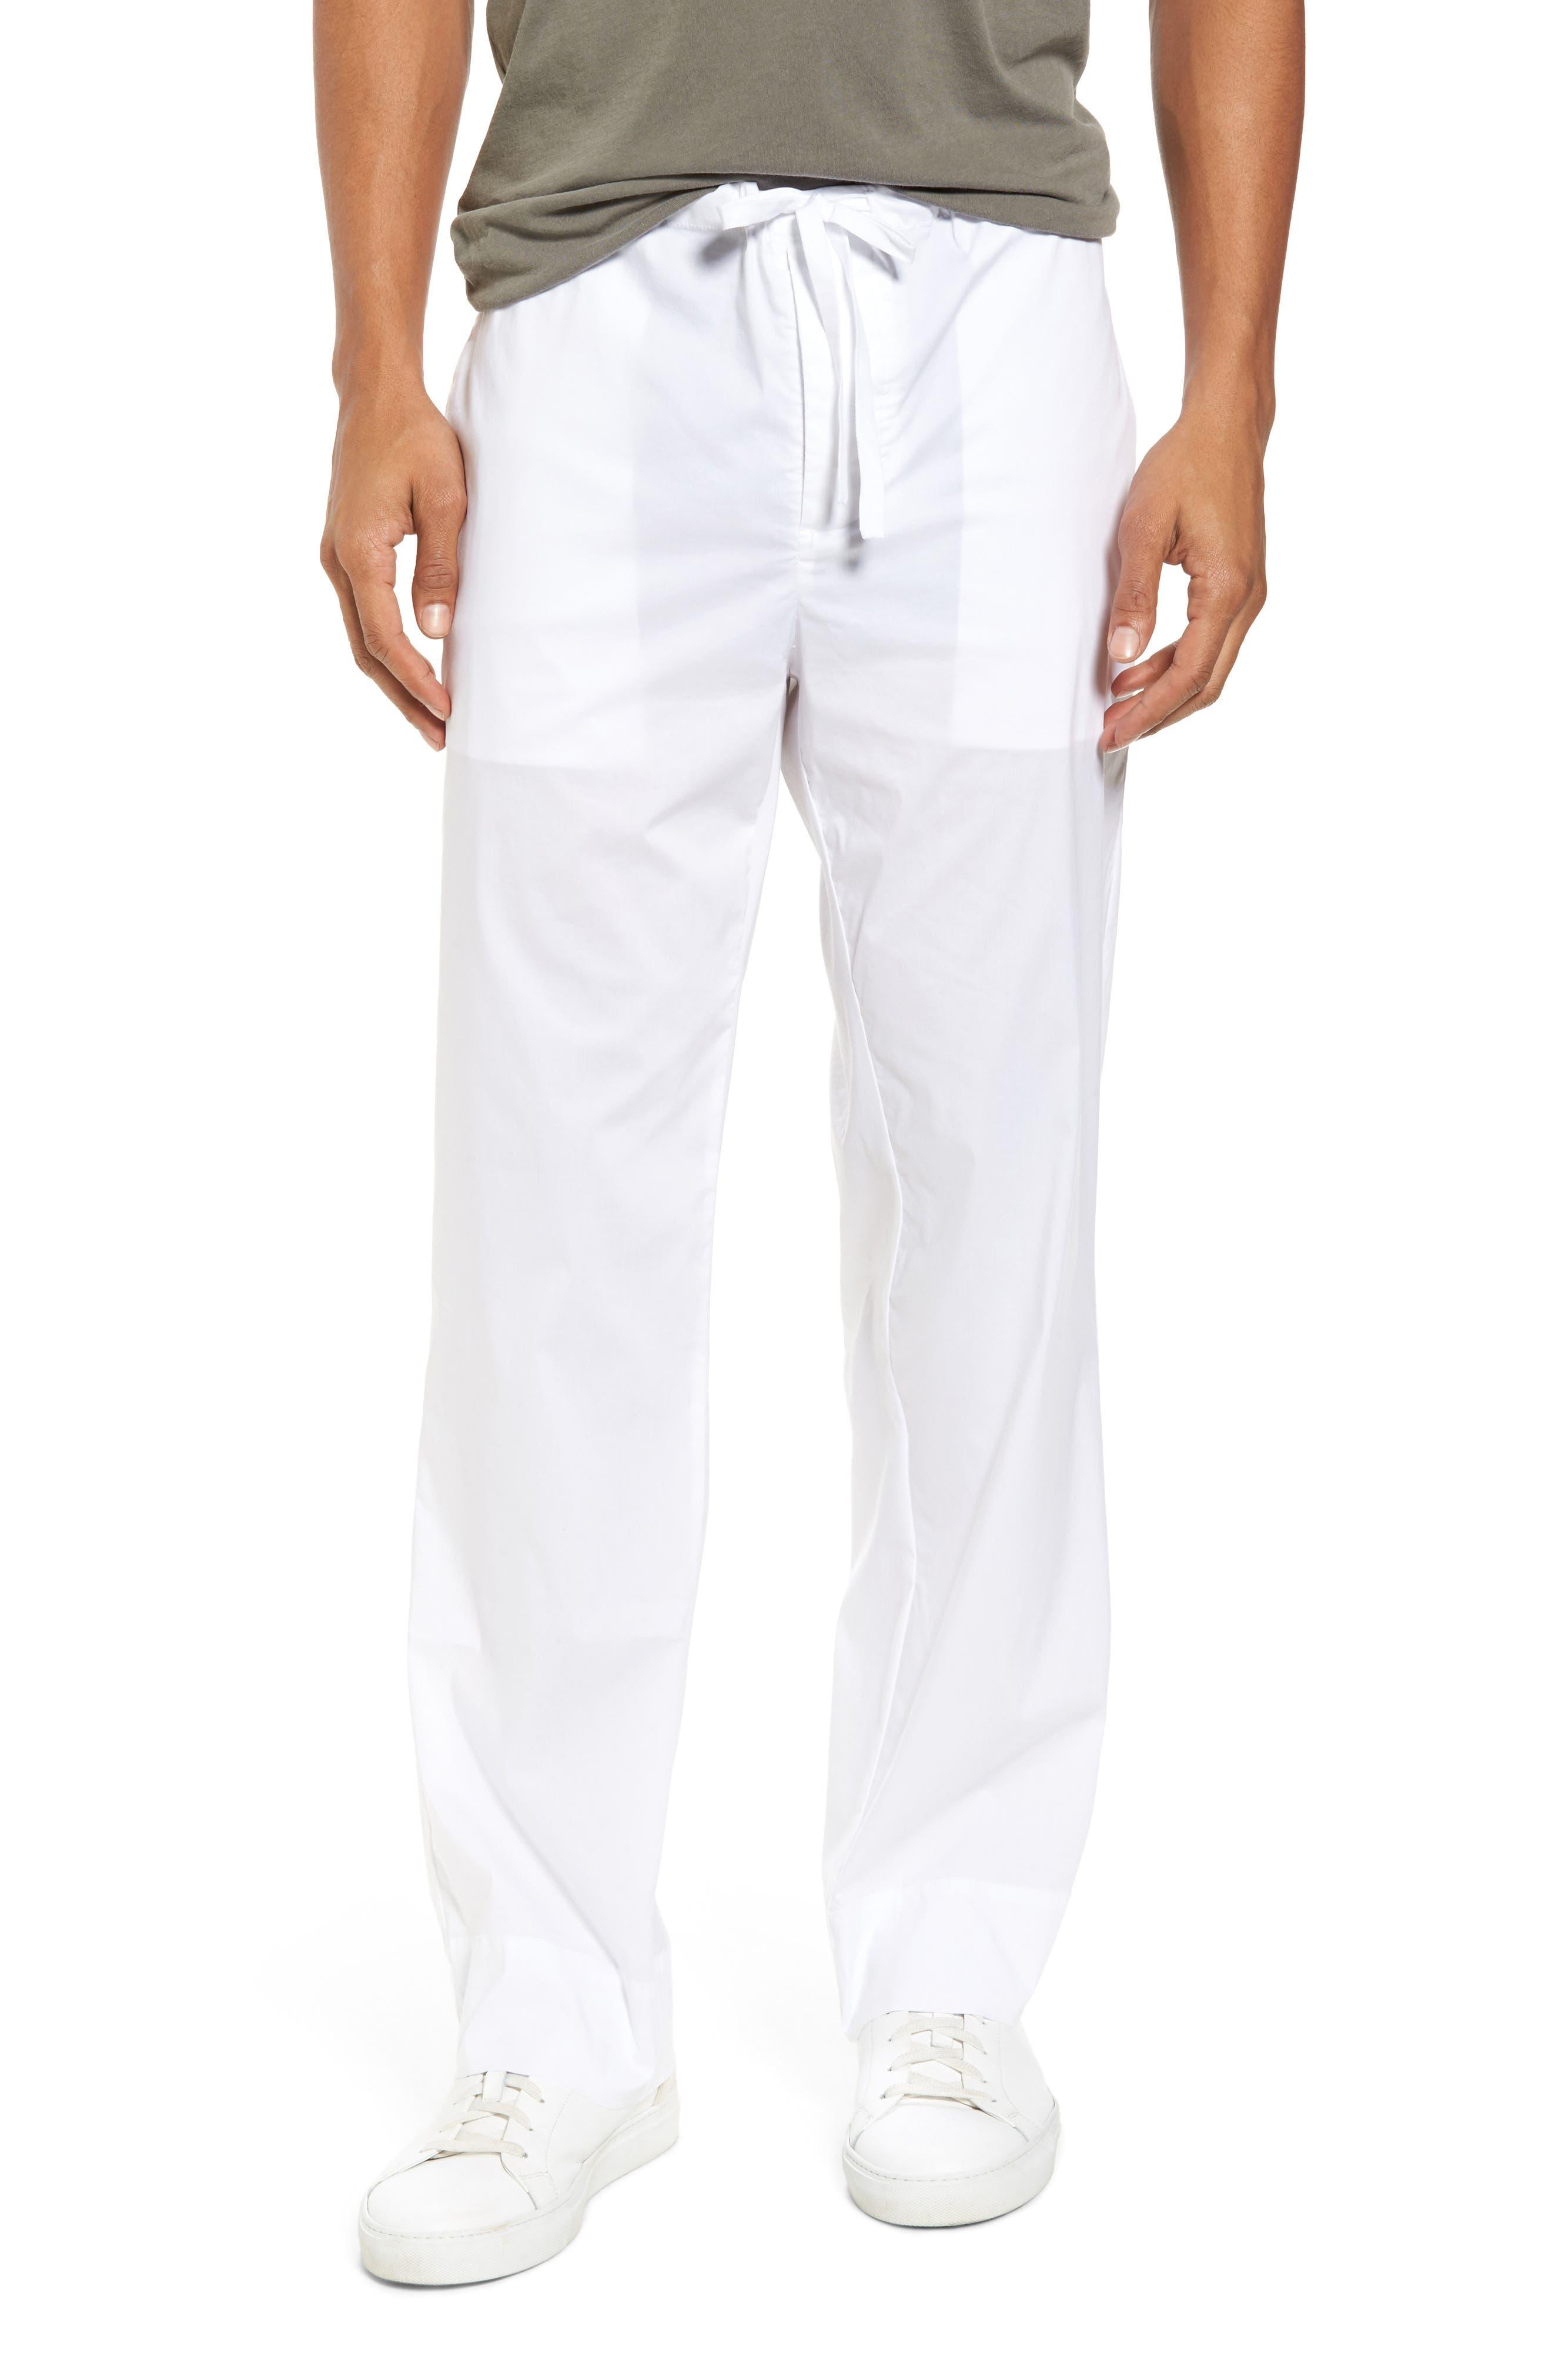 Drawstring Waist Pants,                             Main thumbnail 1, color,                             White